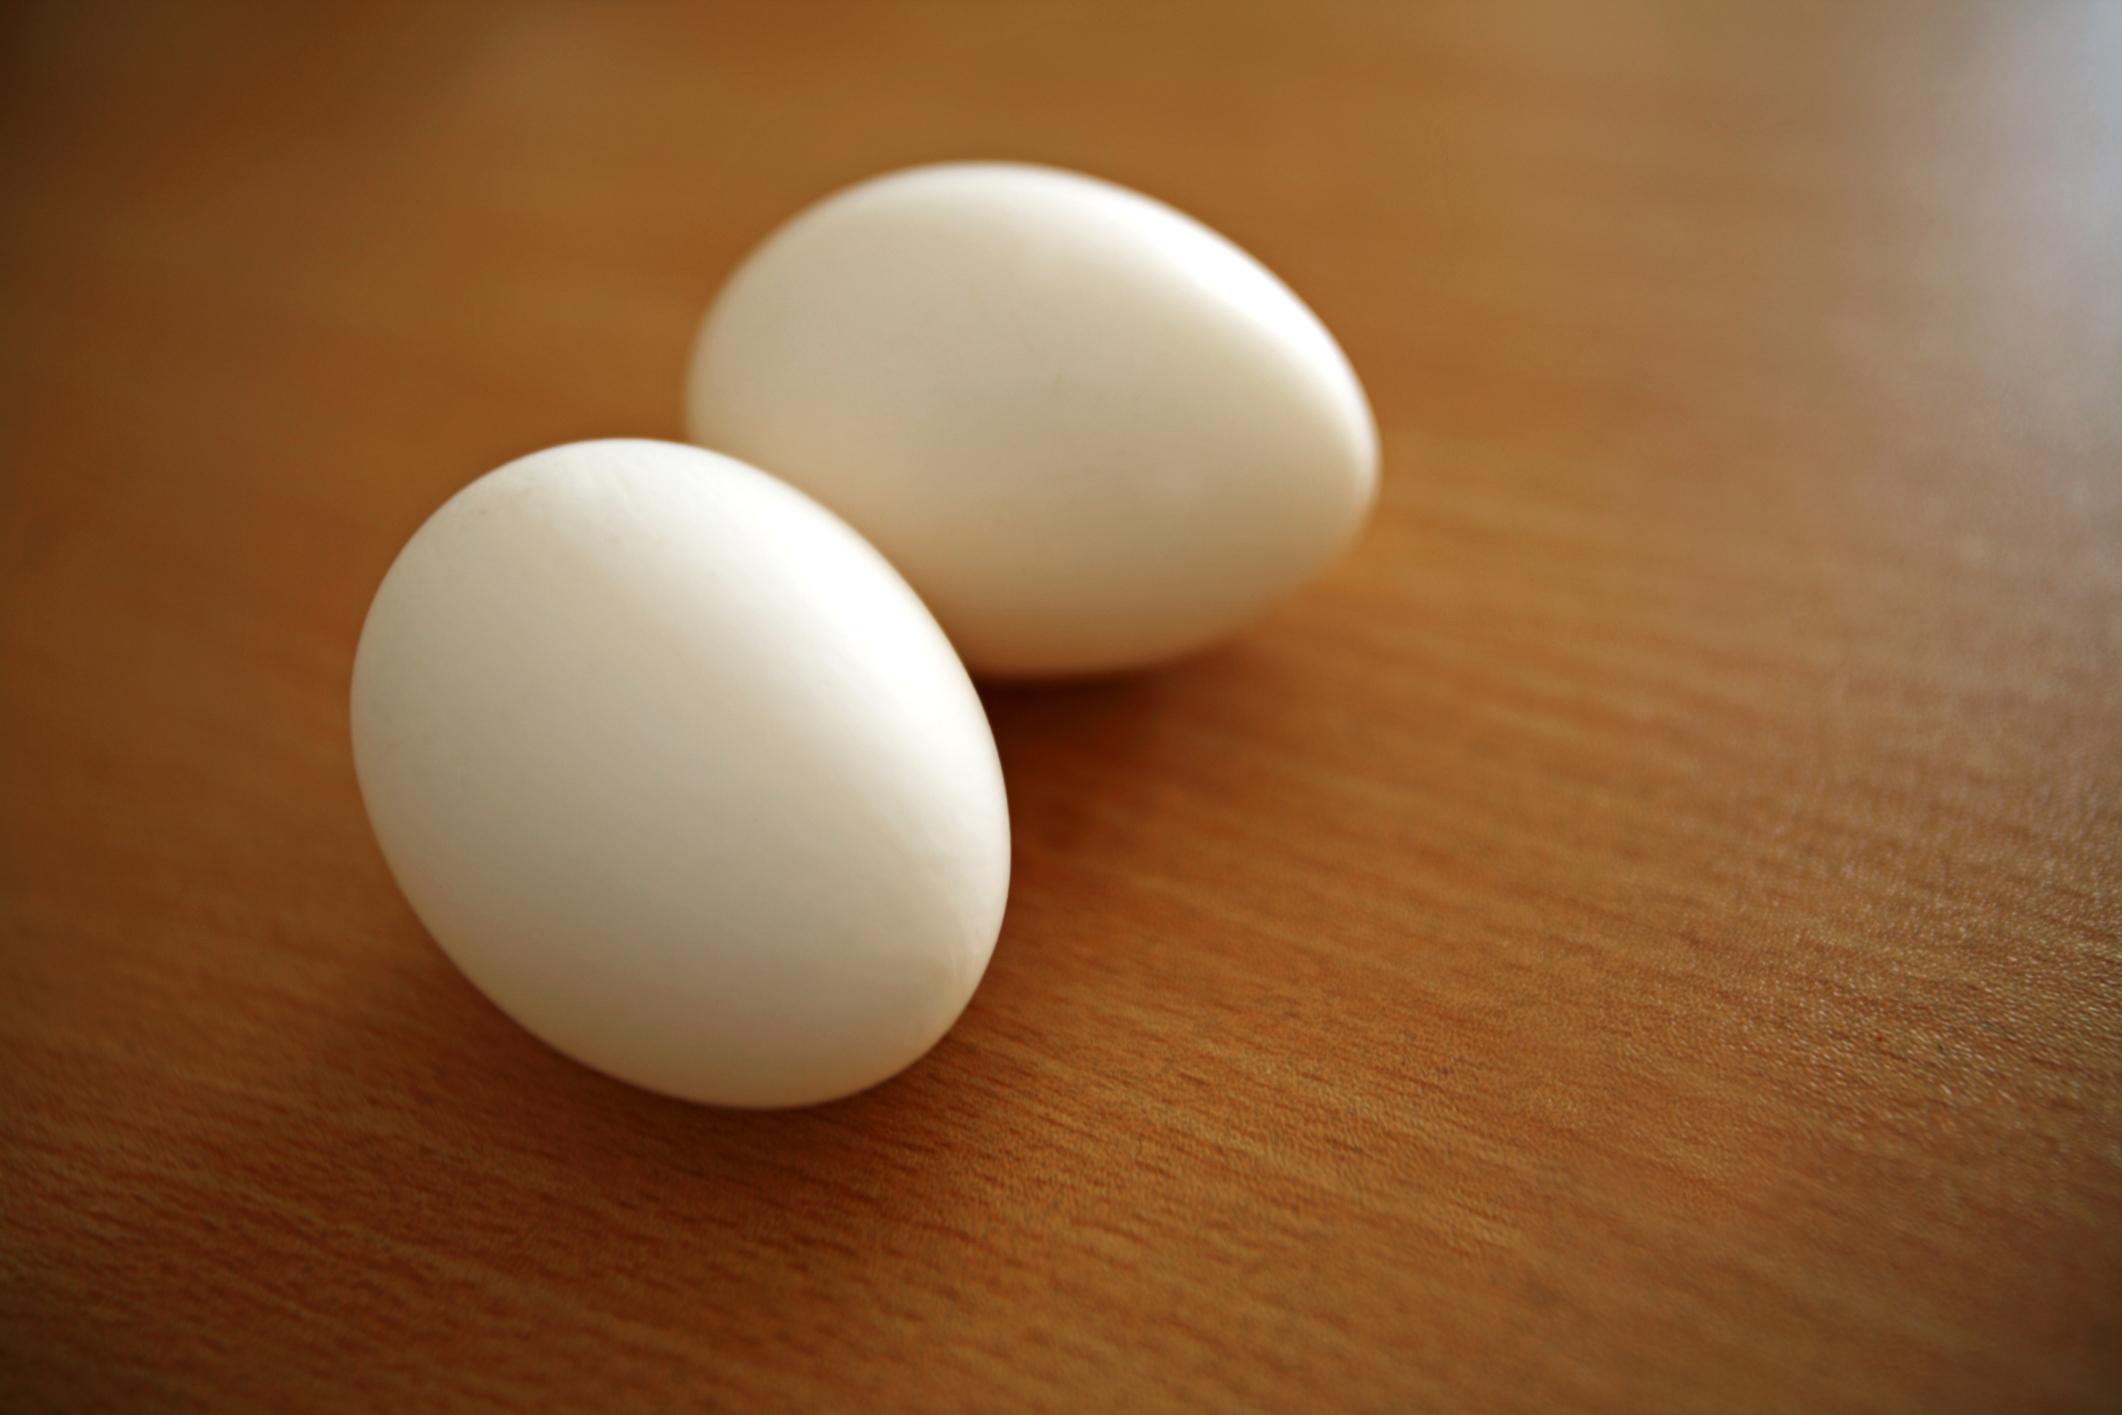 Turkey eggs: benefit and harm